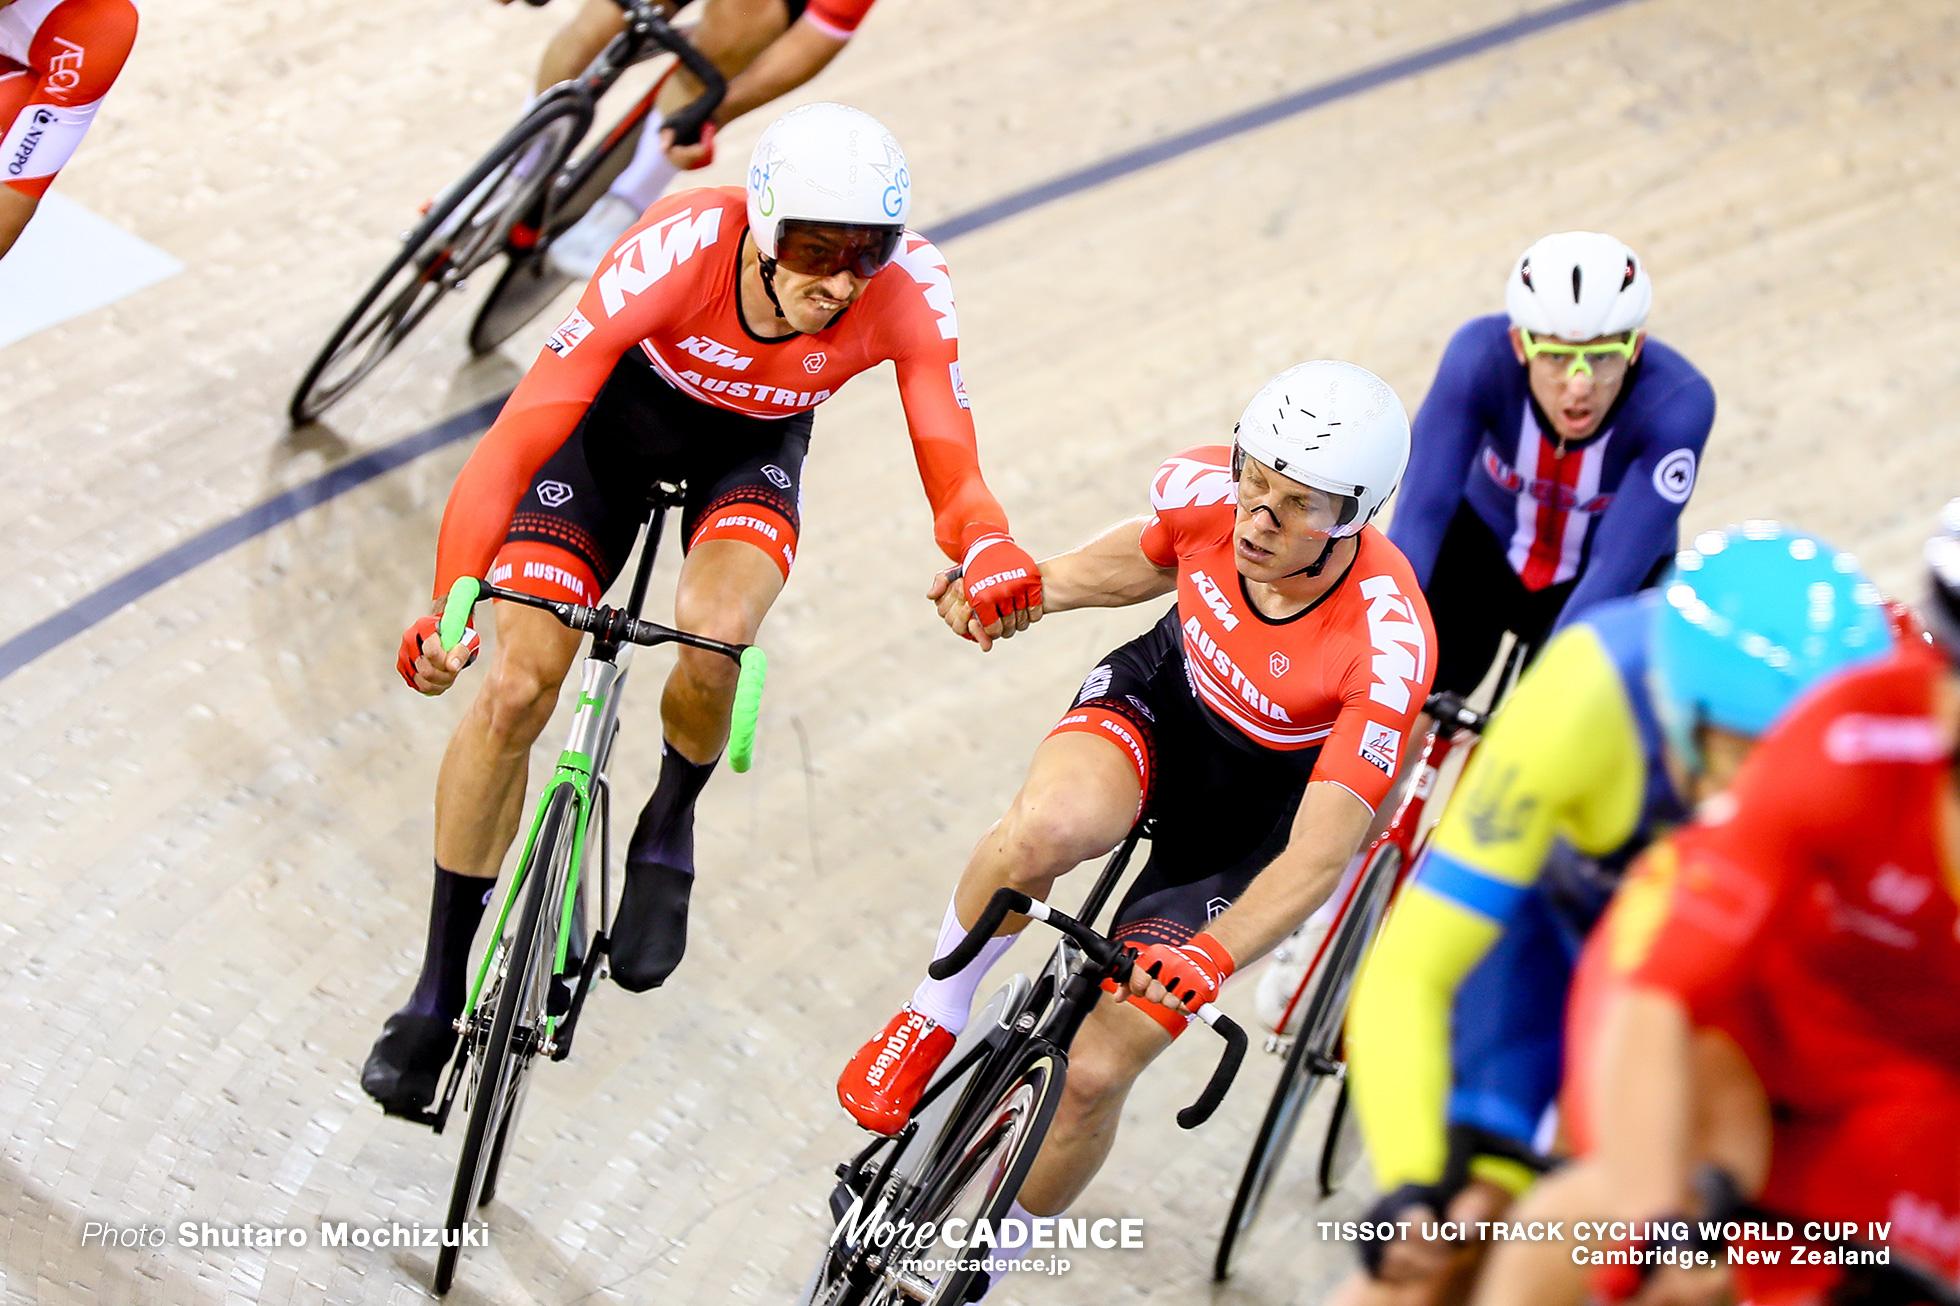 Men's Madison / TISSOT UCI TRACK CYCLING WORLD CUP IV, Cambridge, New Zealand